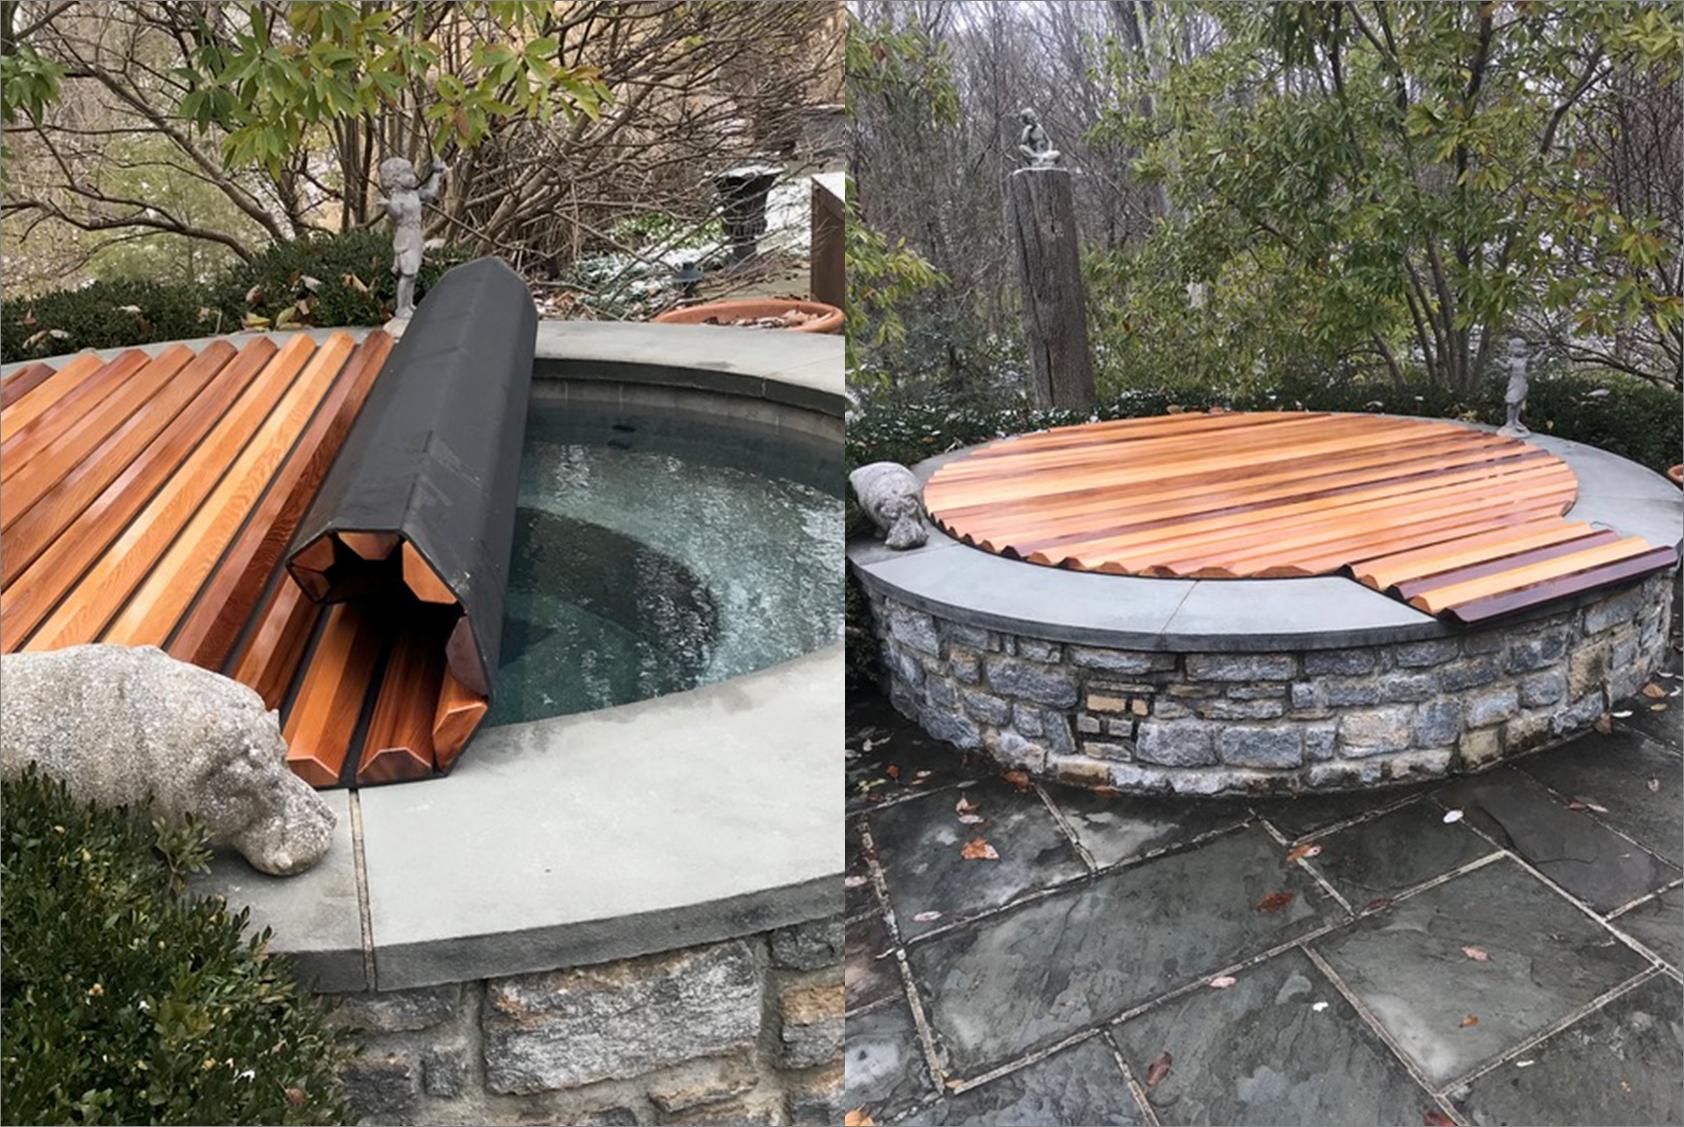 Insulating Structural Cedar Hot Tub Spa Roll Up Cover Cedar Hot Tub Hot Tub Backyard Backyard Layout